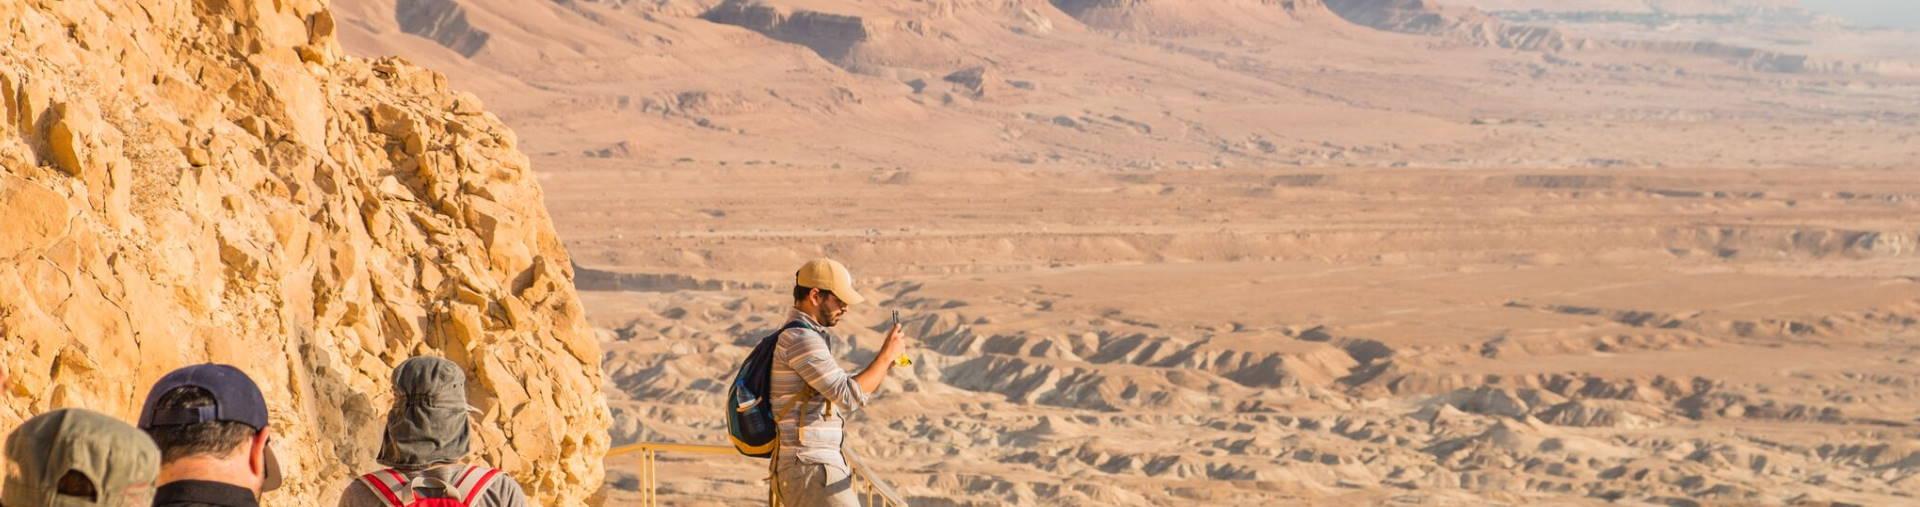 Masada, Ein Gedi & Dead Sea Tour from jerusalem